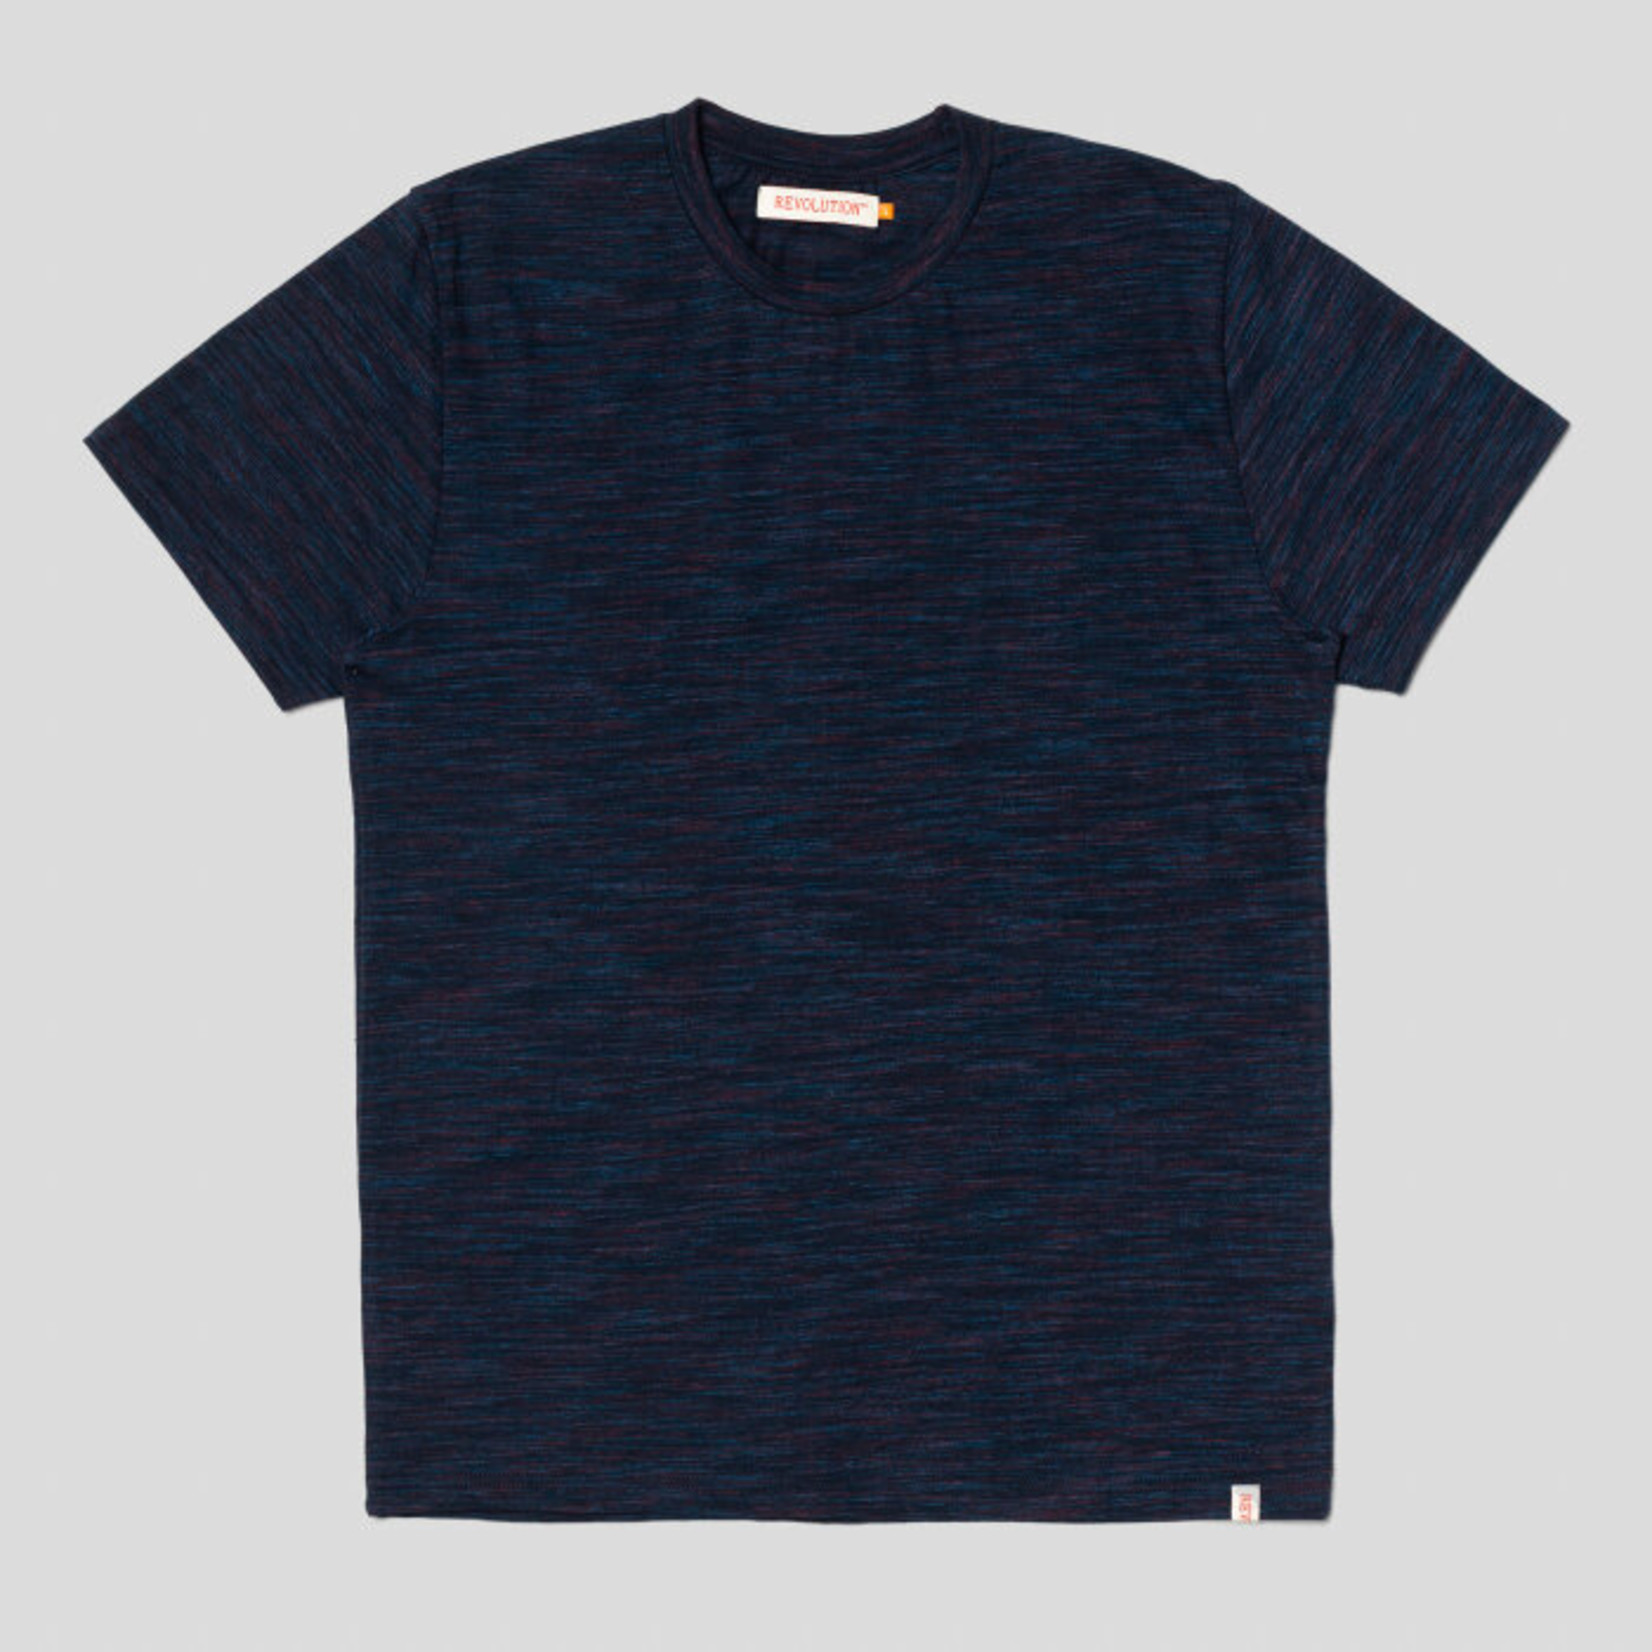 RVLT Revolution Revolution 1218 T-Shirt